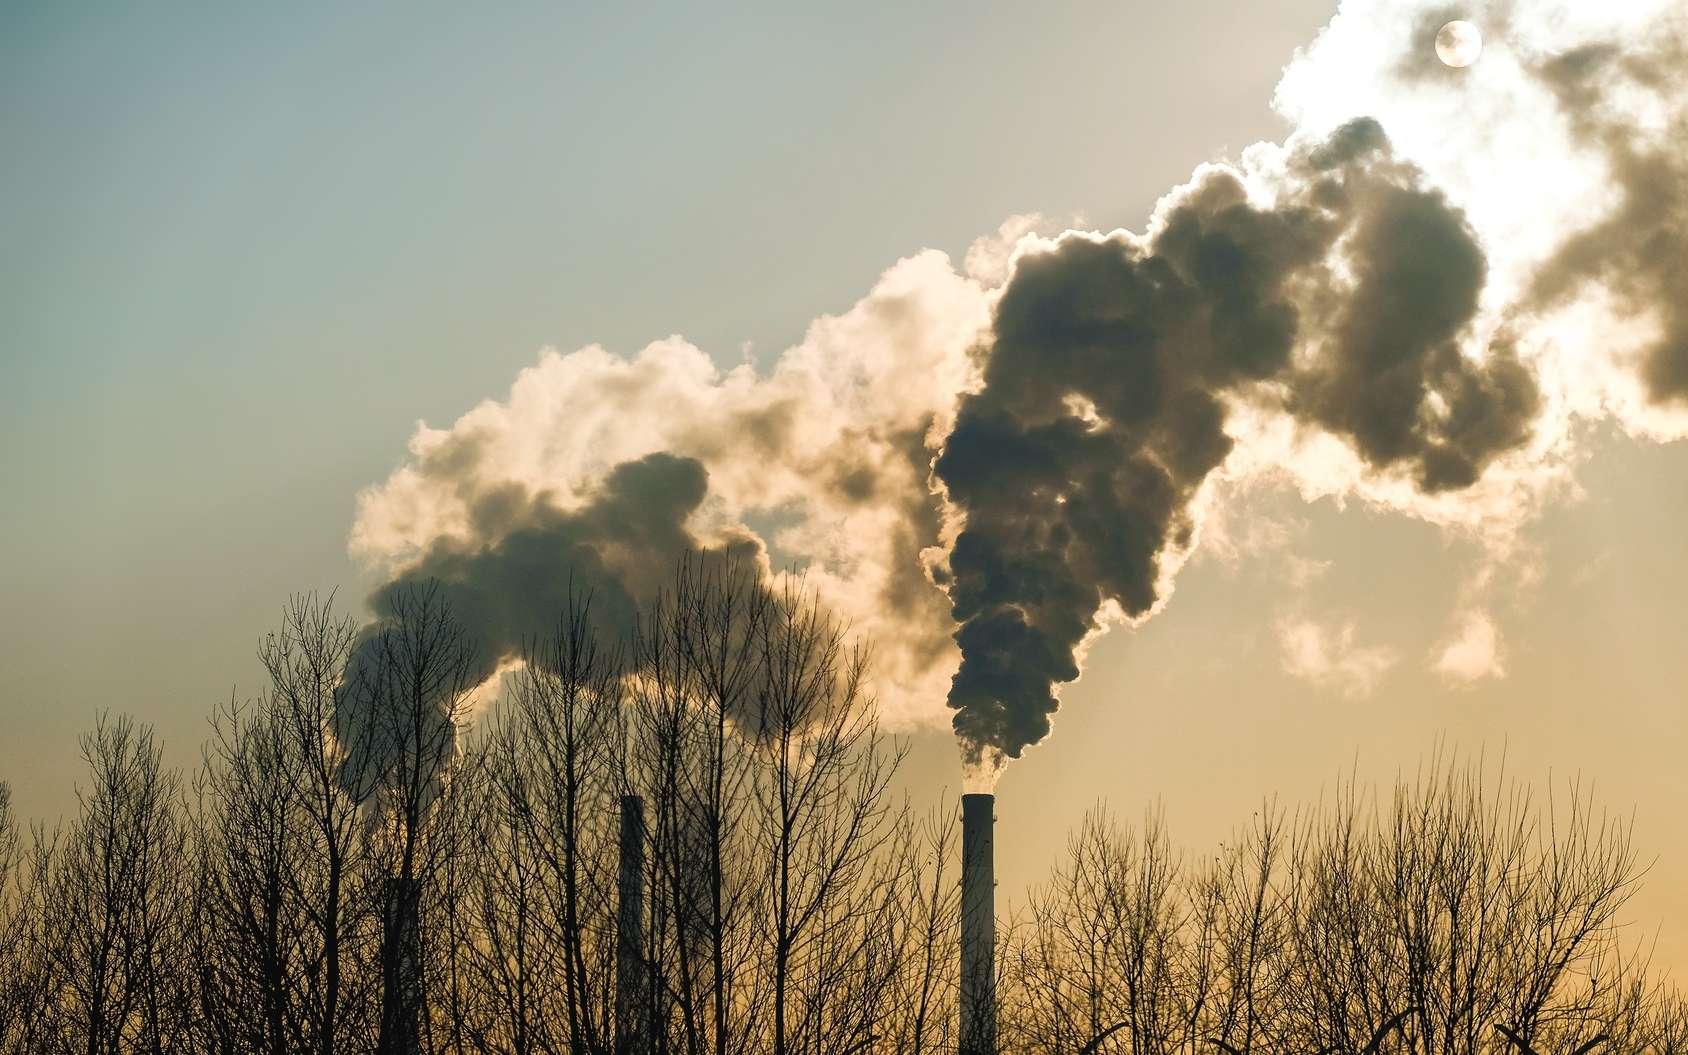 Les émissions de gaz à effet de serre continuent d'augmenter. © Seroma72, Fotolia